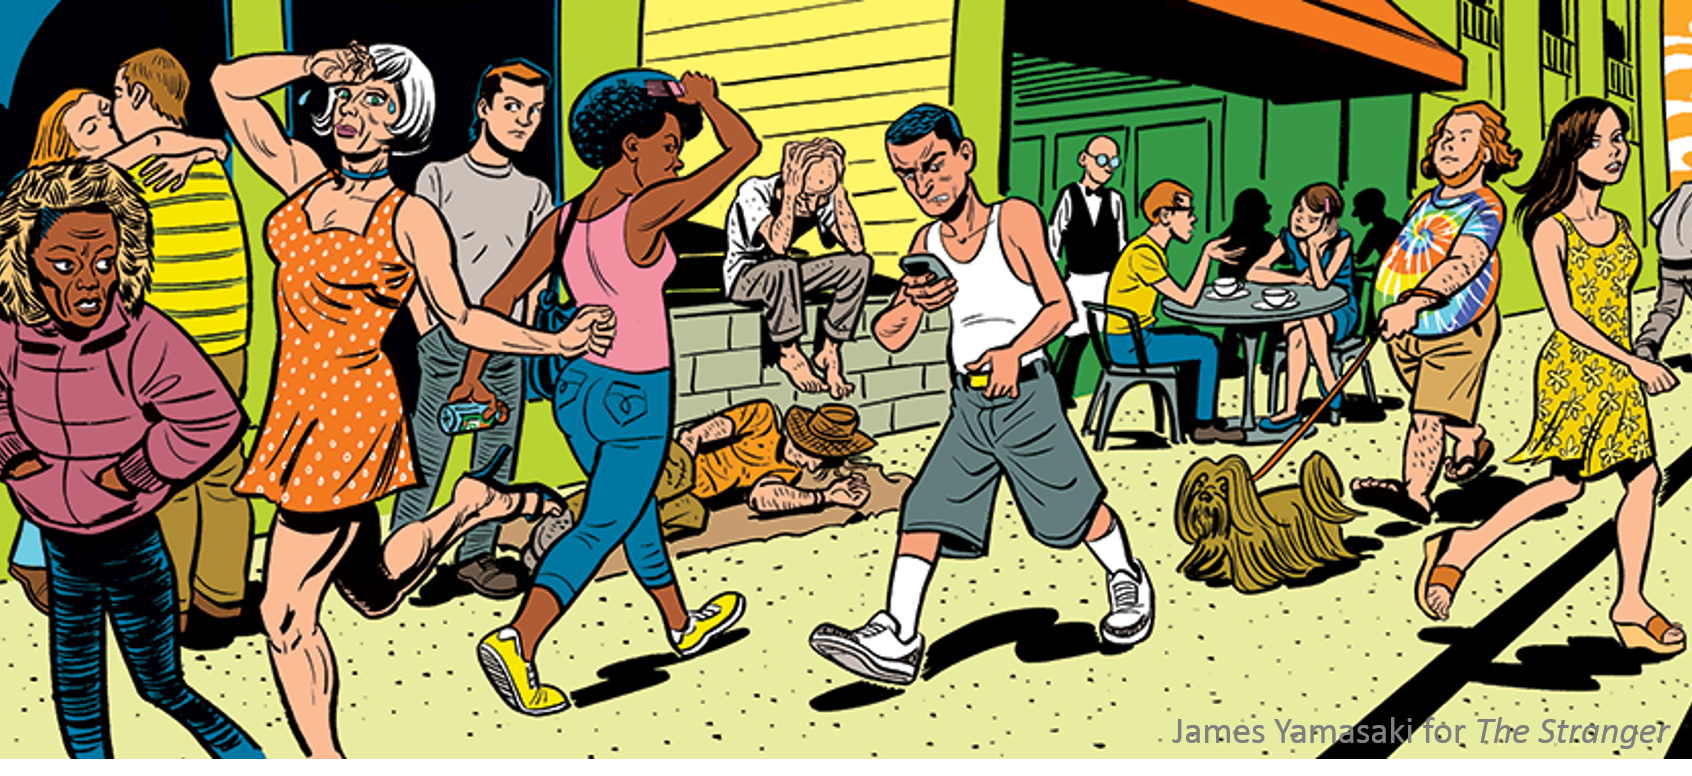 James Yamasaki, The Stranger city summer